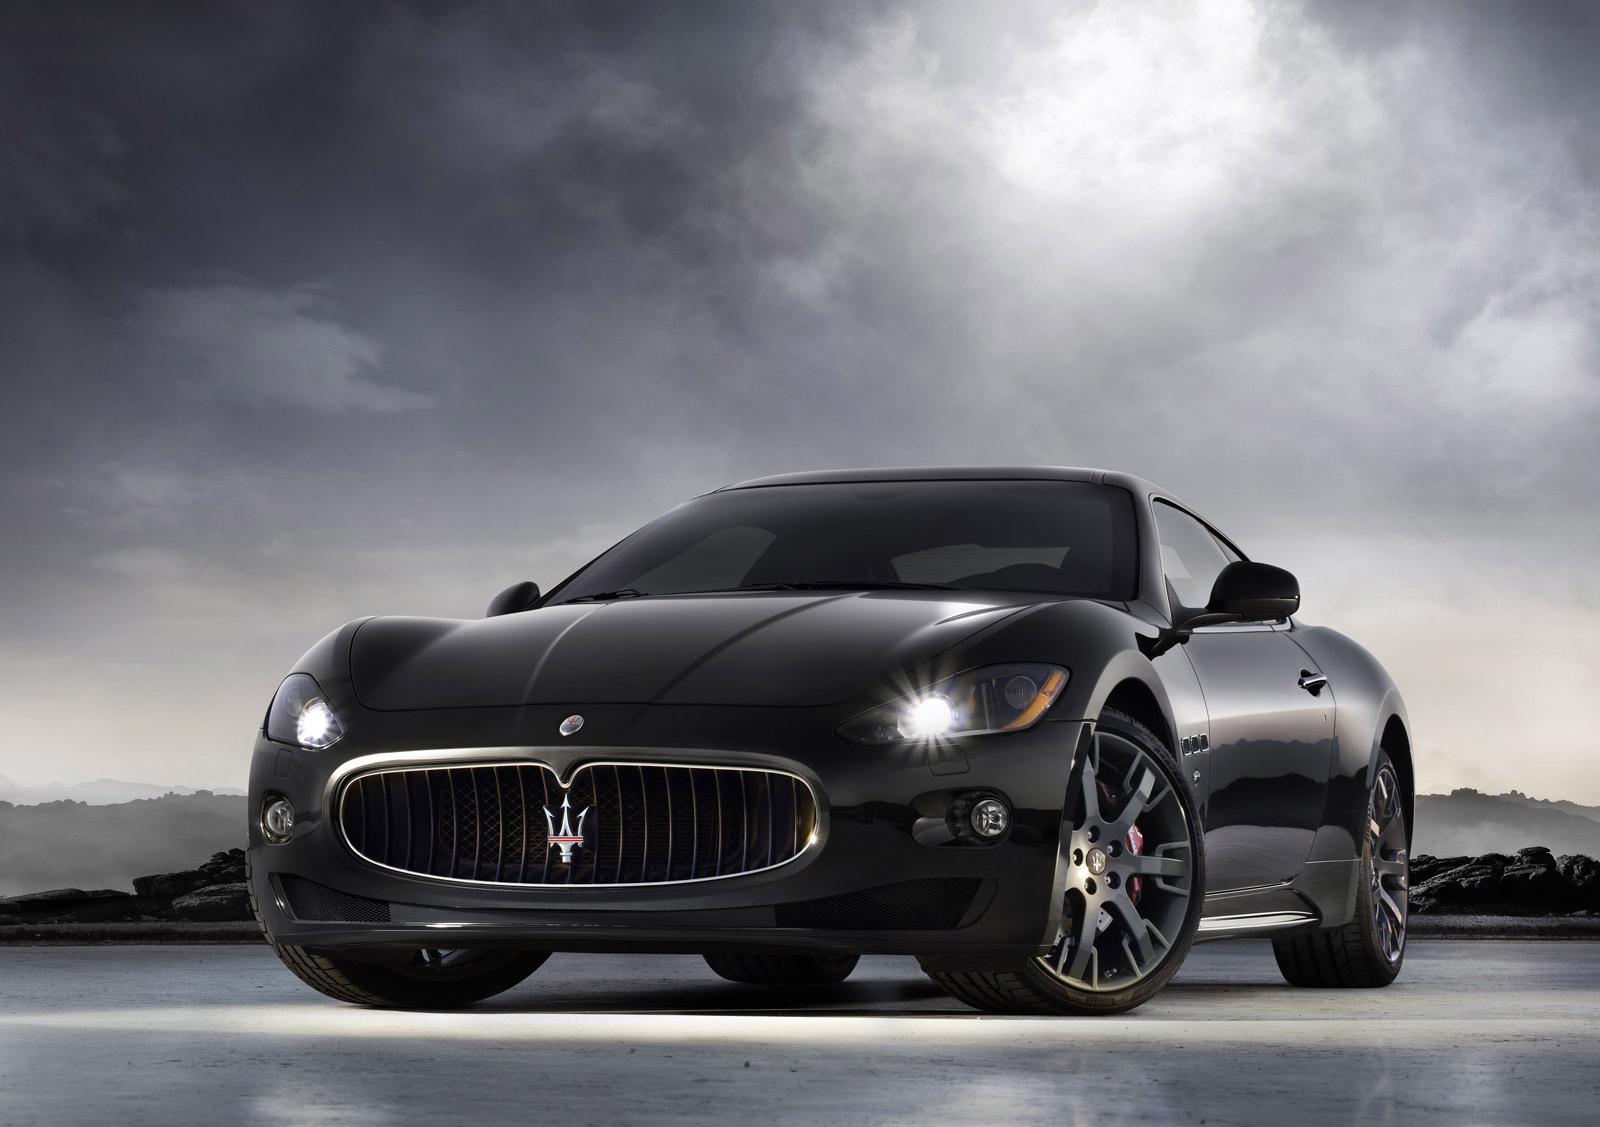 Granturismo 4.2 ou 4200 coupé manuelle ou V8 Vantage ? Maserati-gran-turismo-s-8